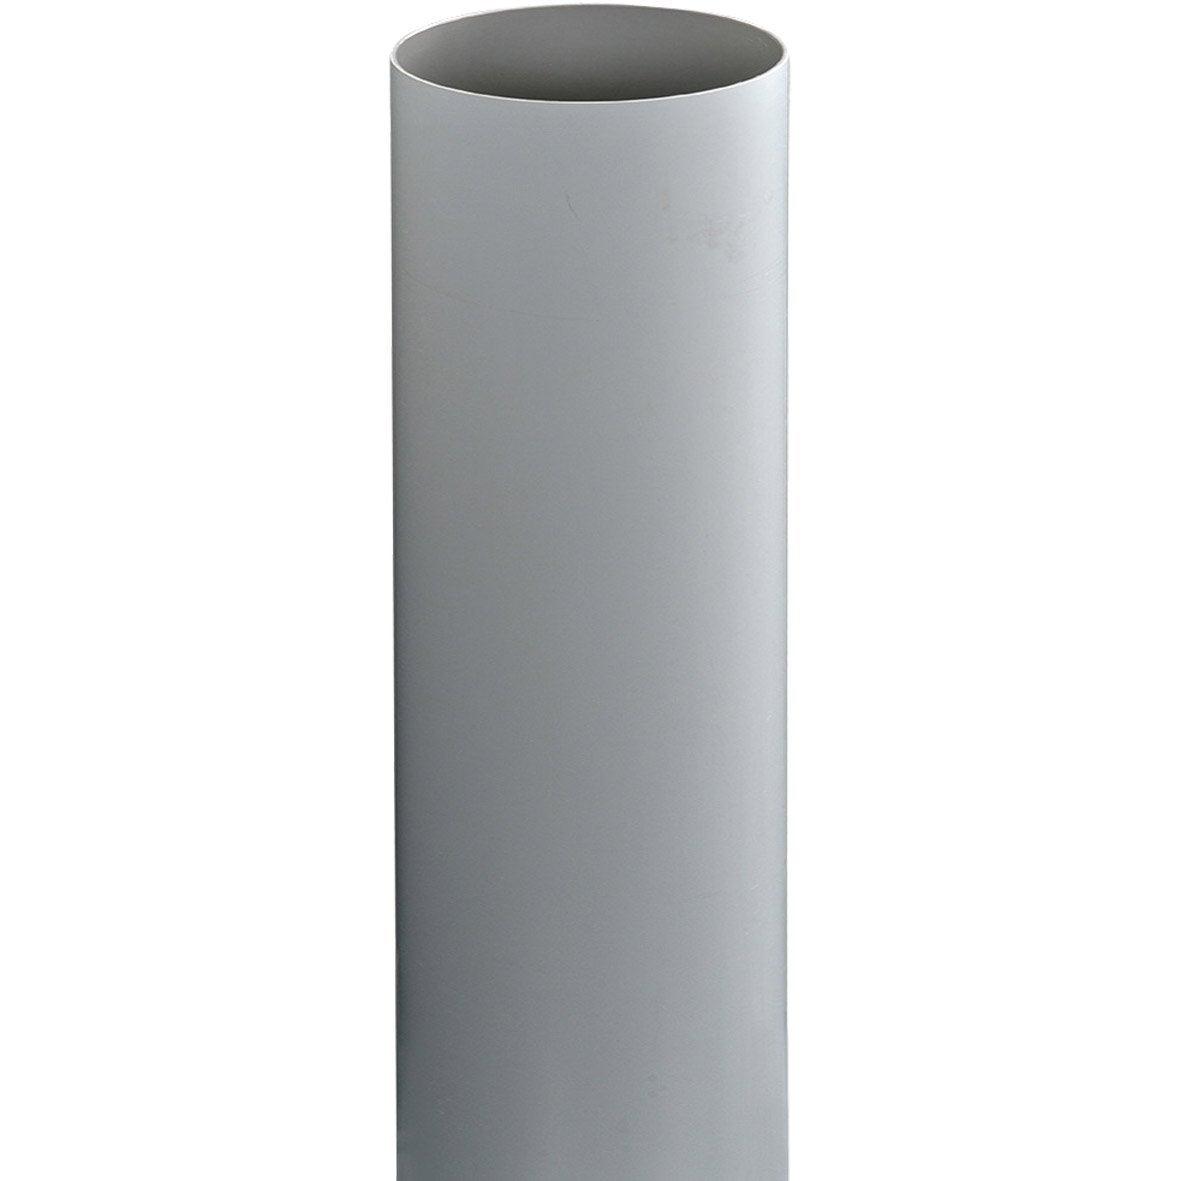 tuyau de descente pvc gris mm l 4 m girpi leroy merlin. Black Bedroom Furniture Sets. Home Design Ideas